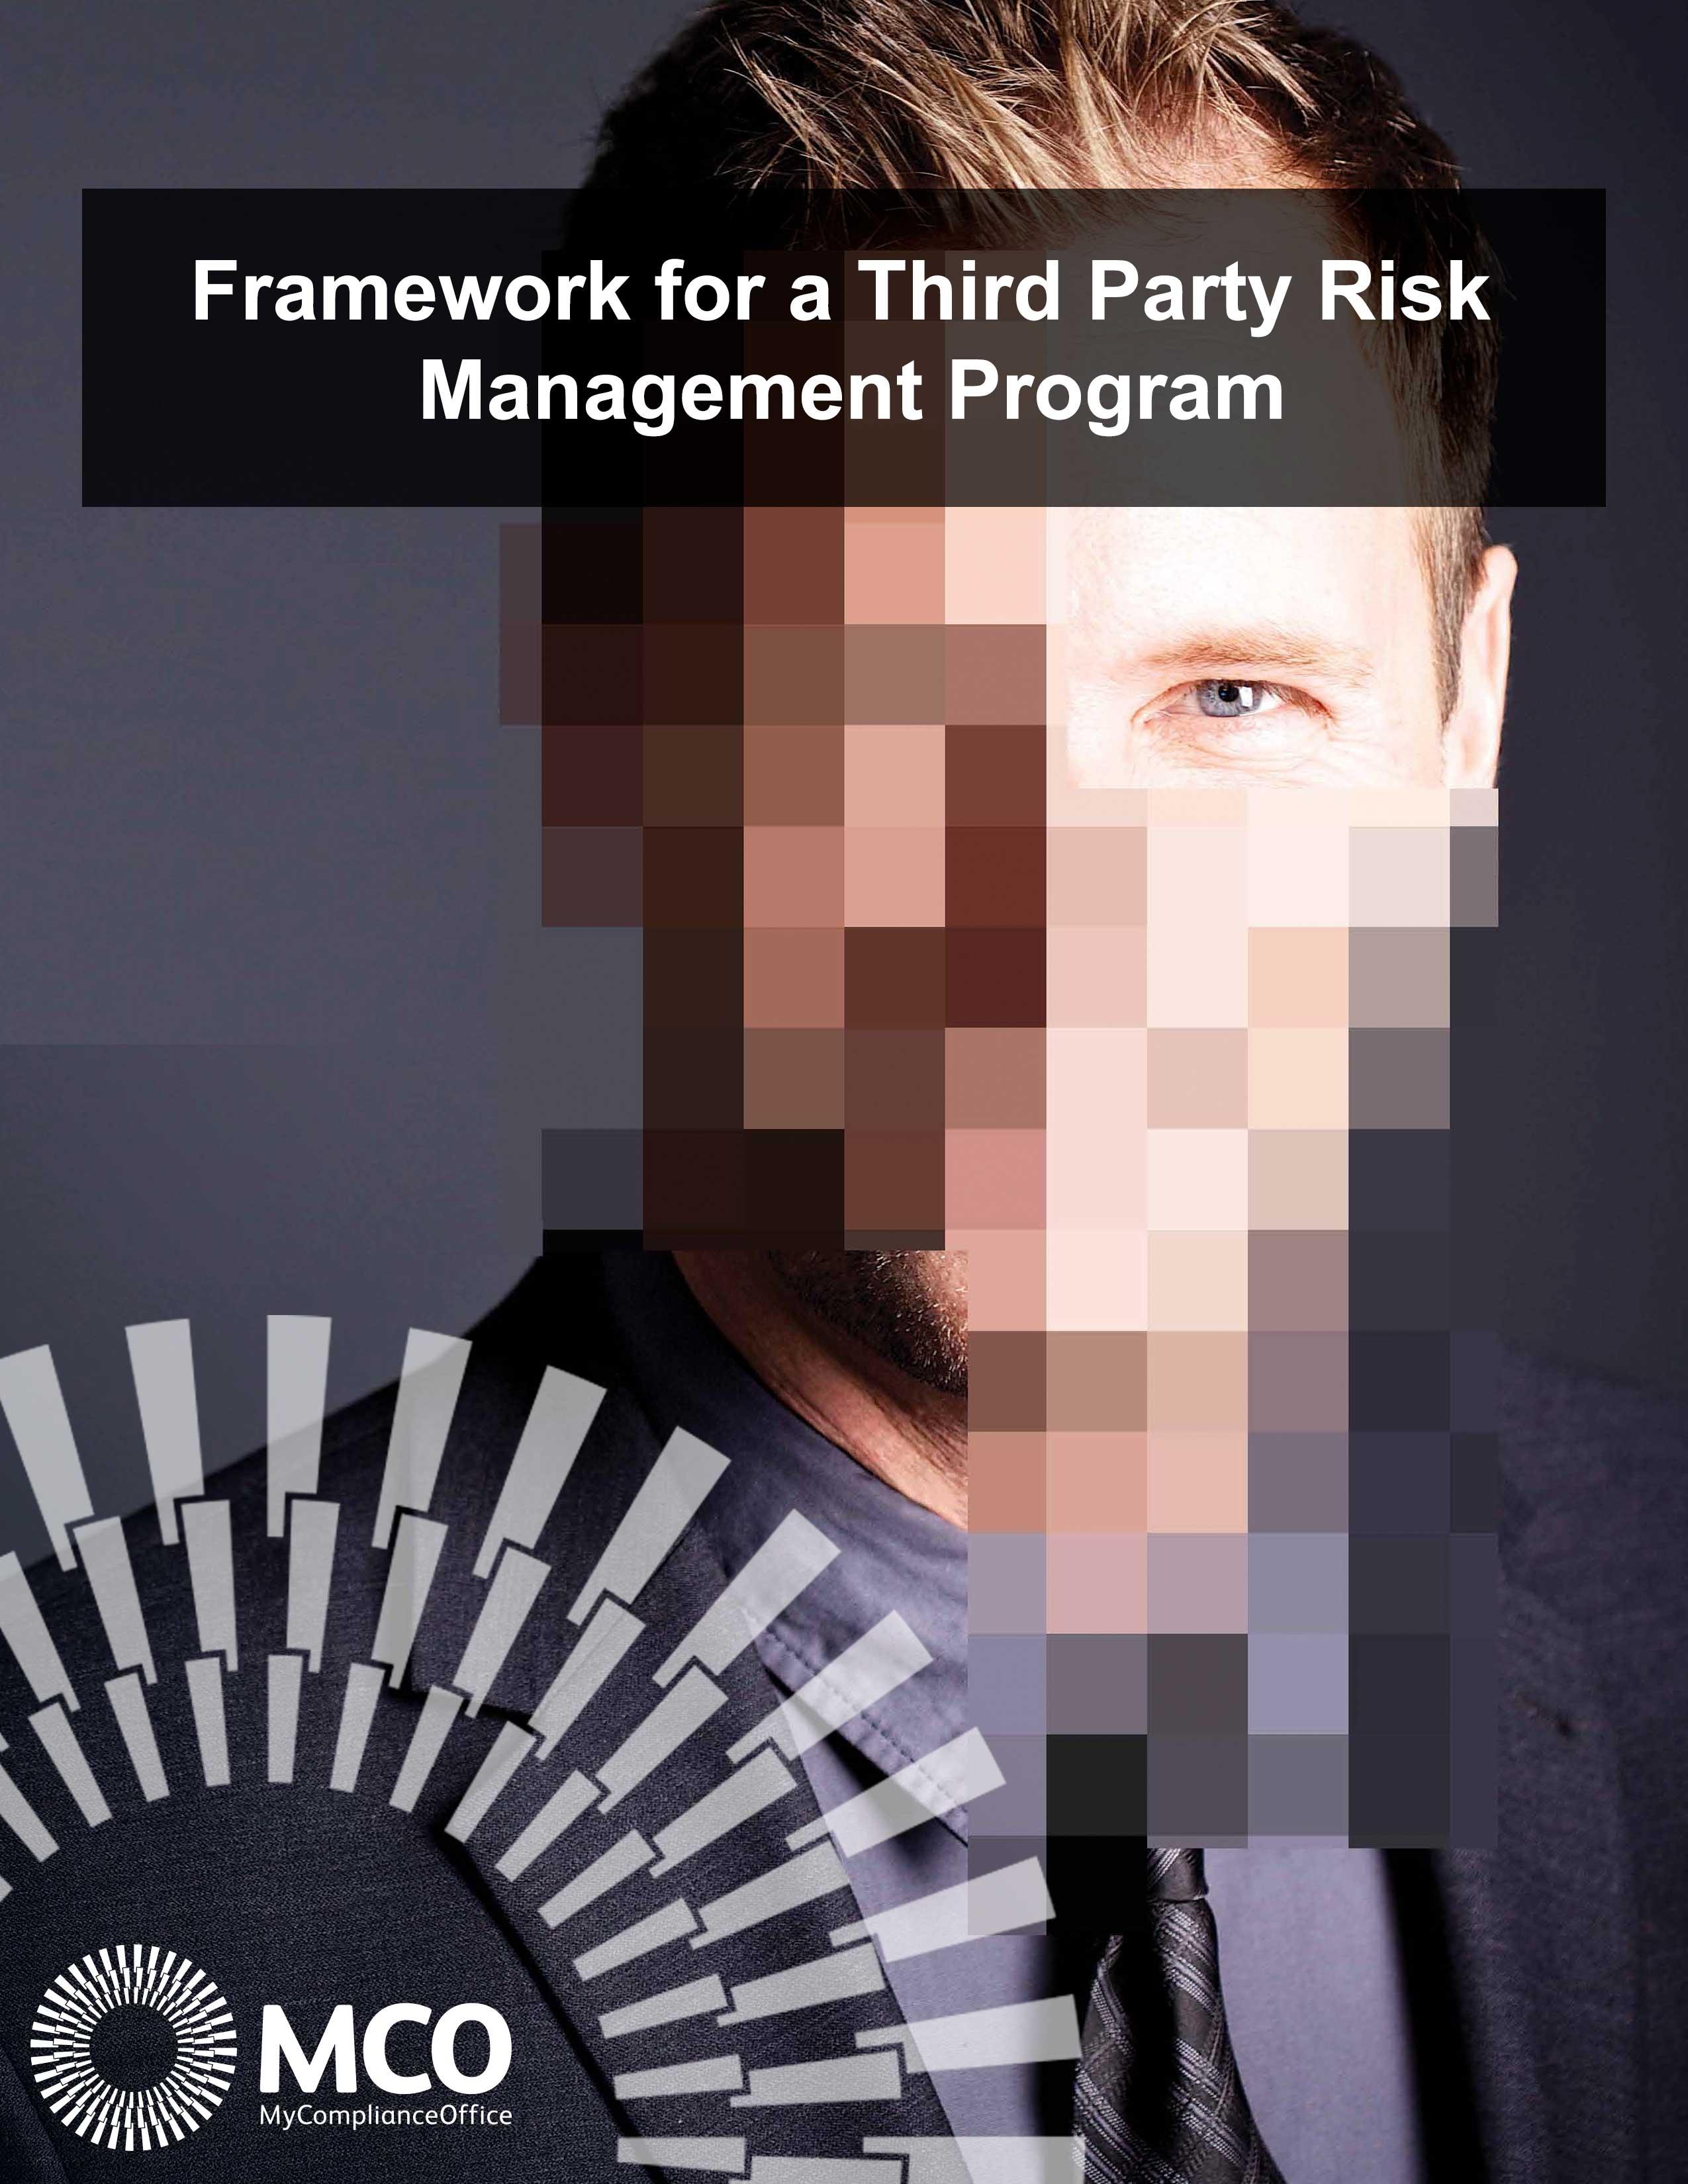 Framework-for-a-Third-Party-Risk-Management-Program.jpg